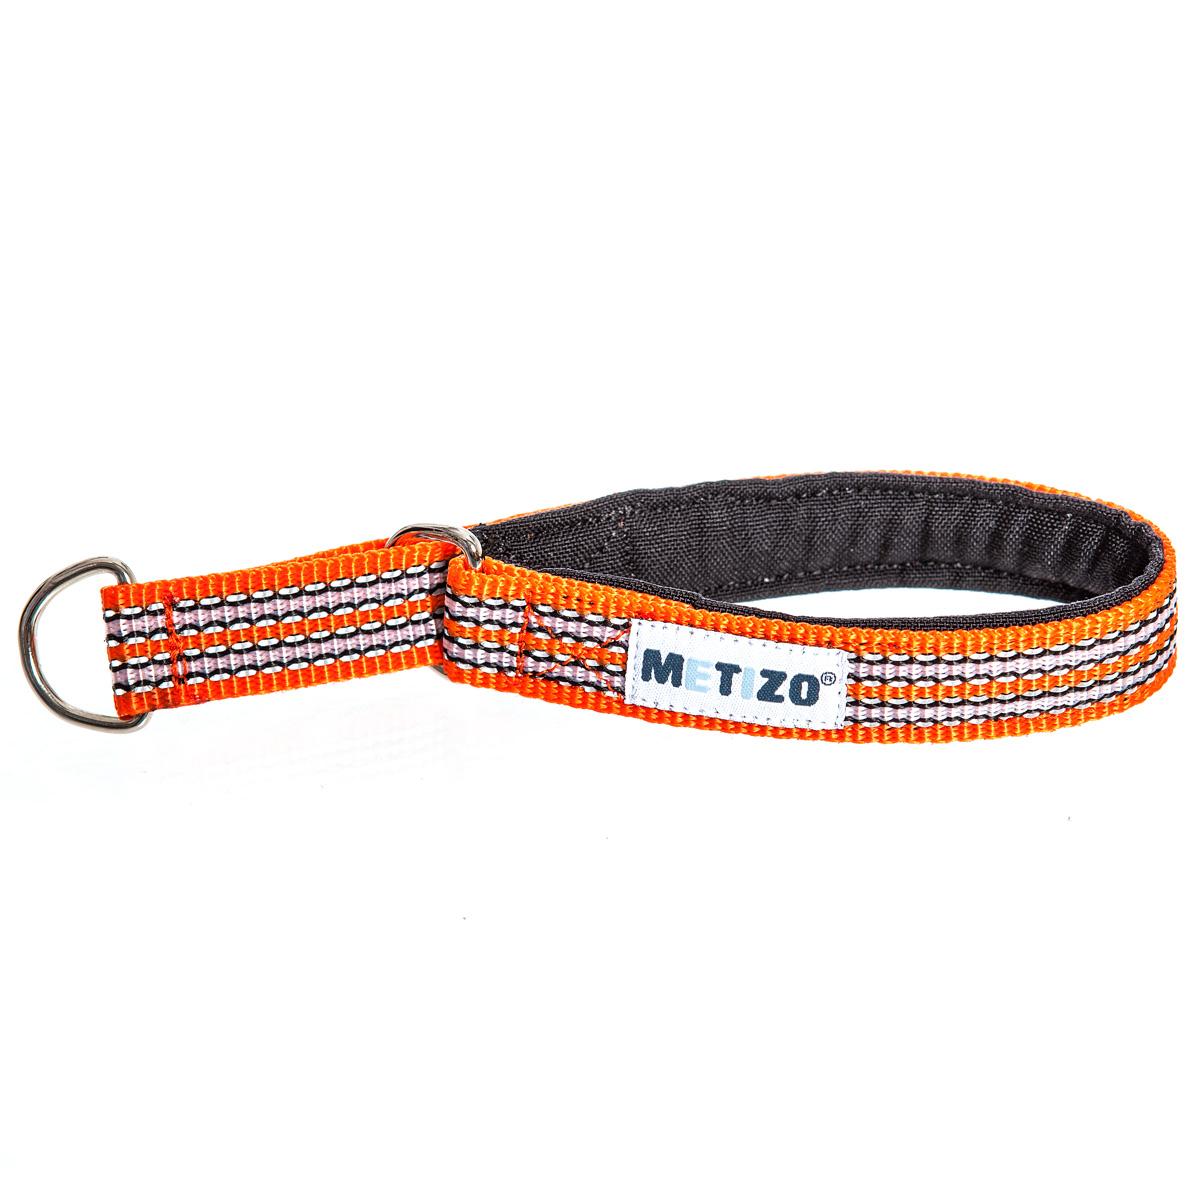 Metizo halsband orange